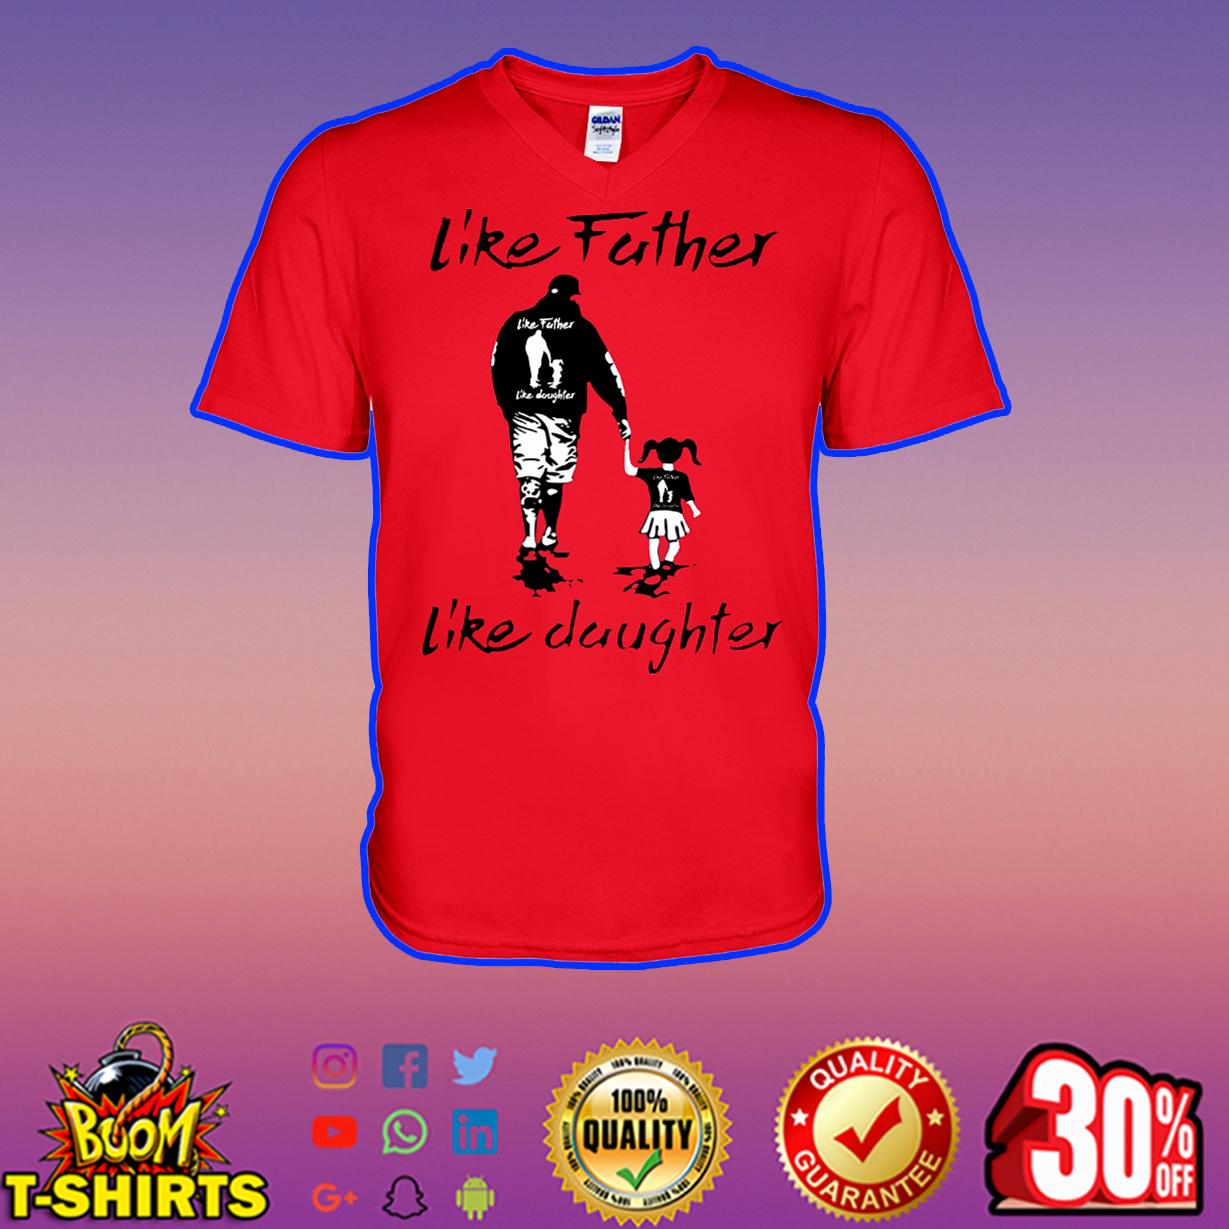 Like father like daughter v-neck